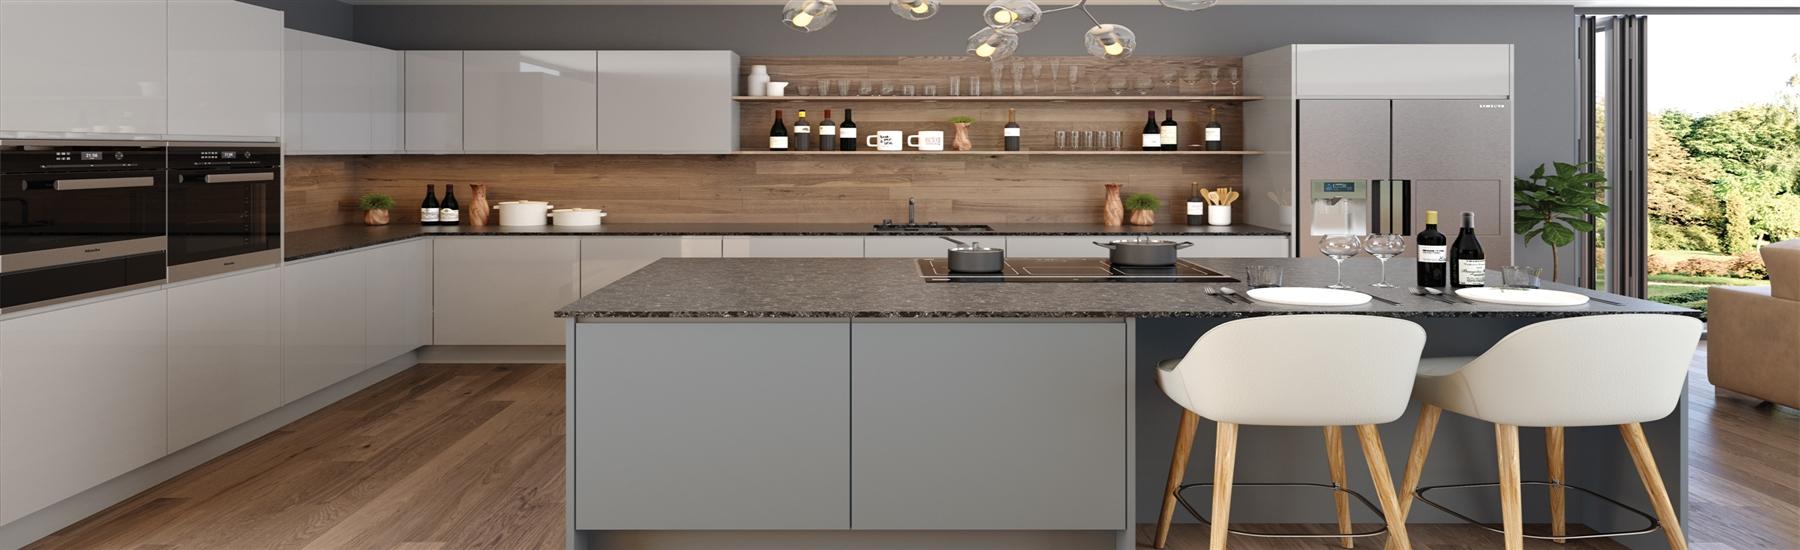 jayline-kitchen-cupboard-doors